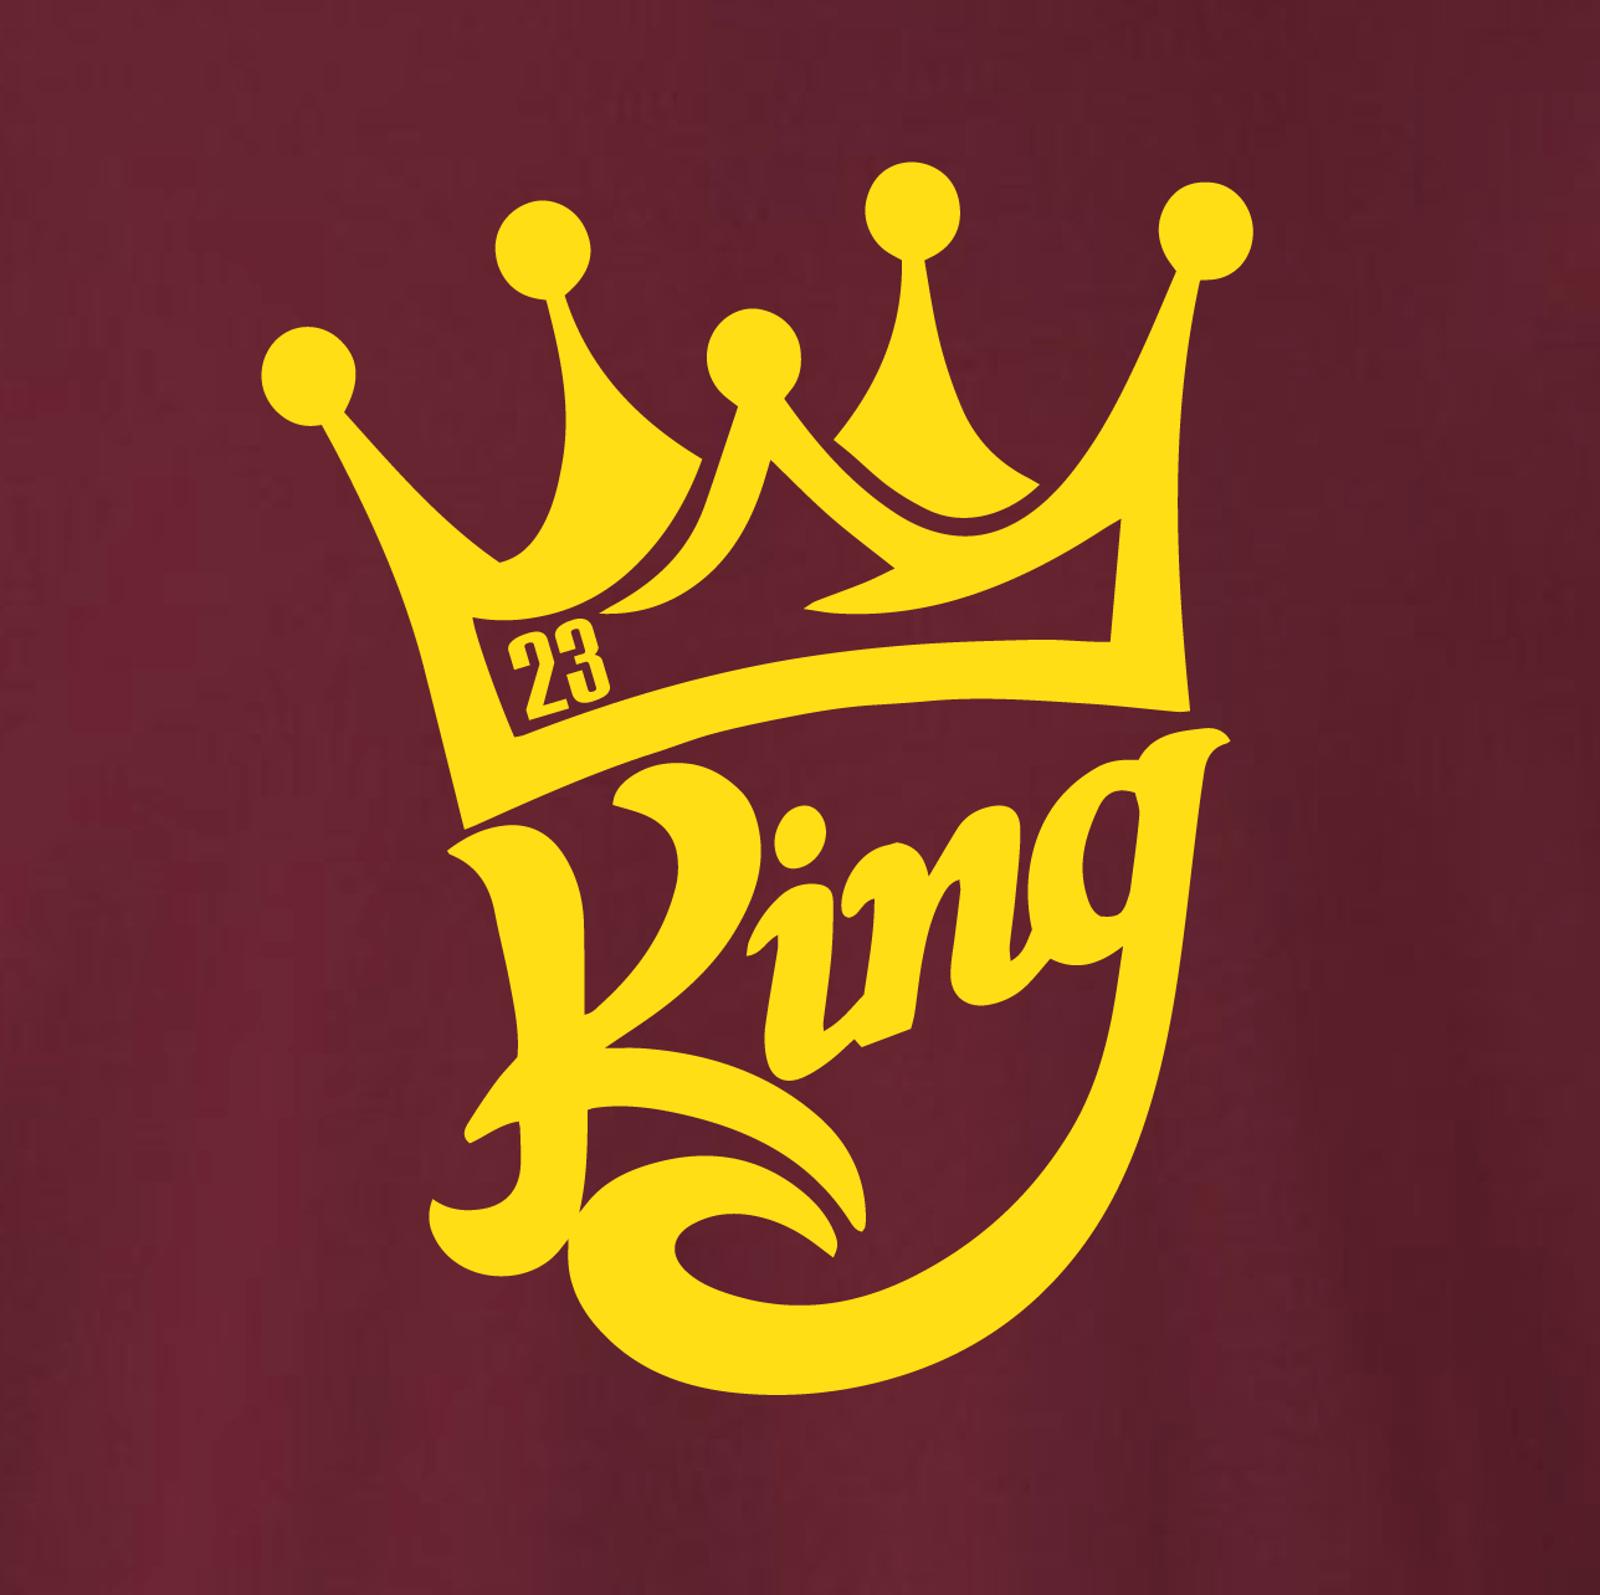 King Lebron James Logo Posted By Samantha Tremblay